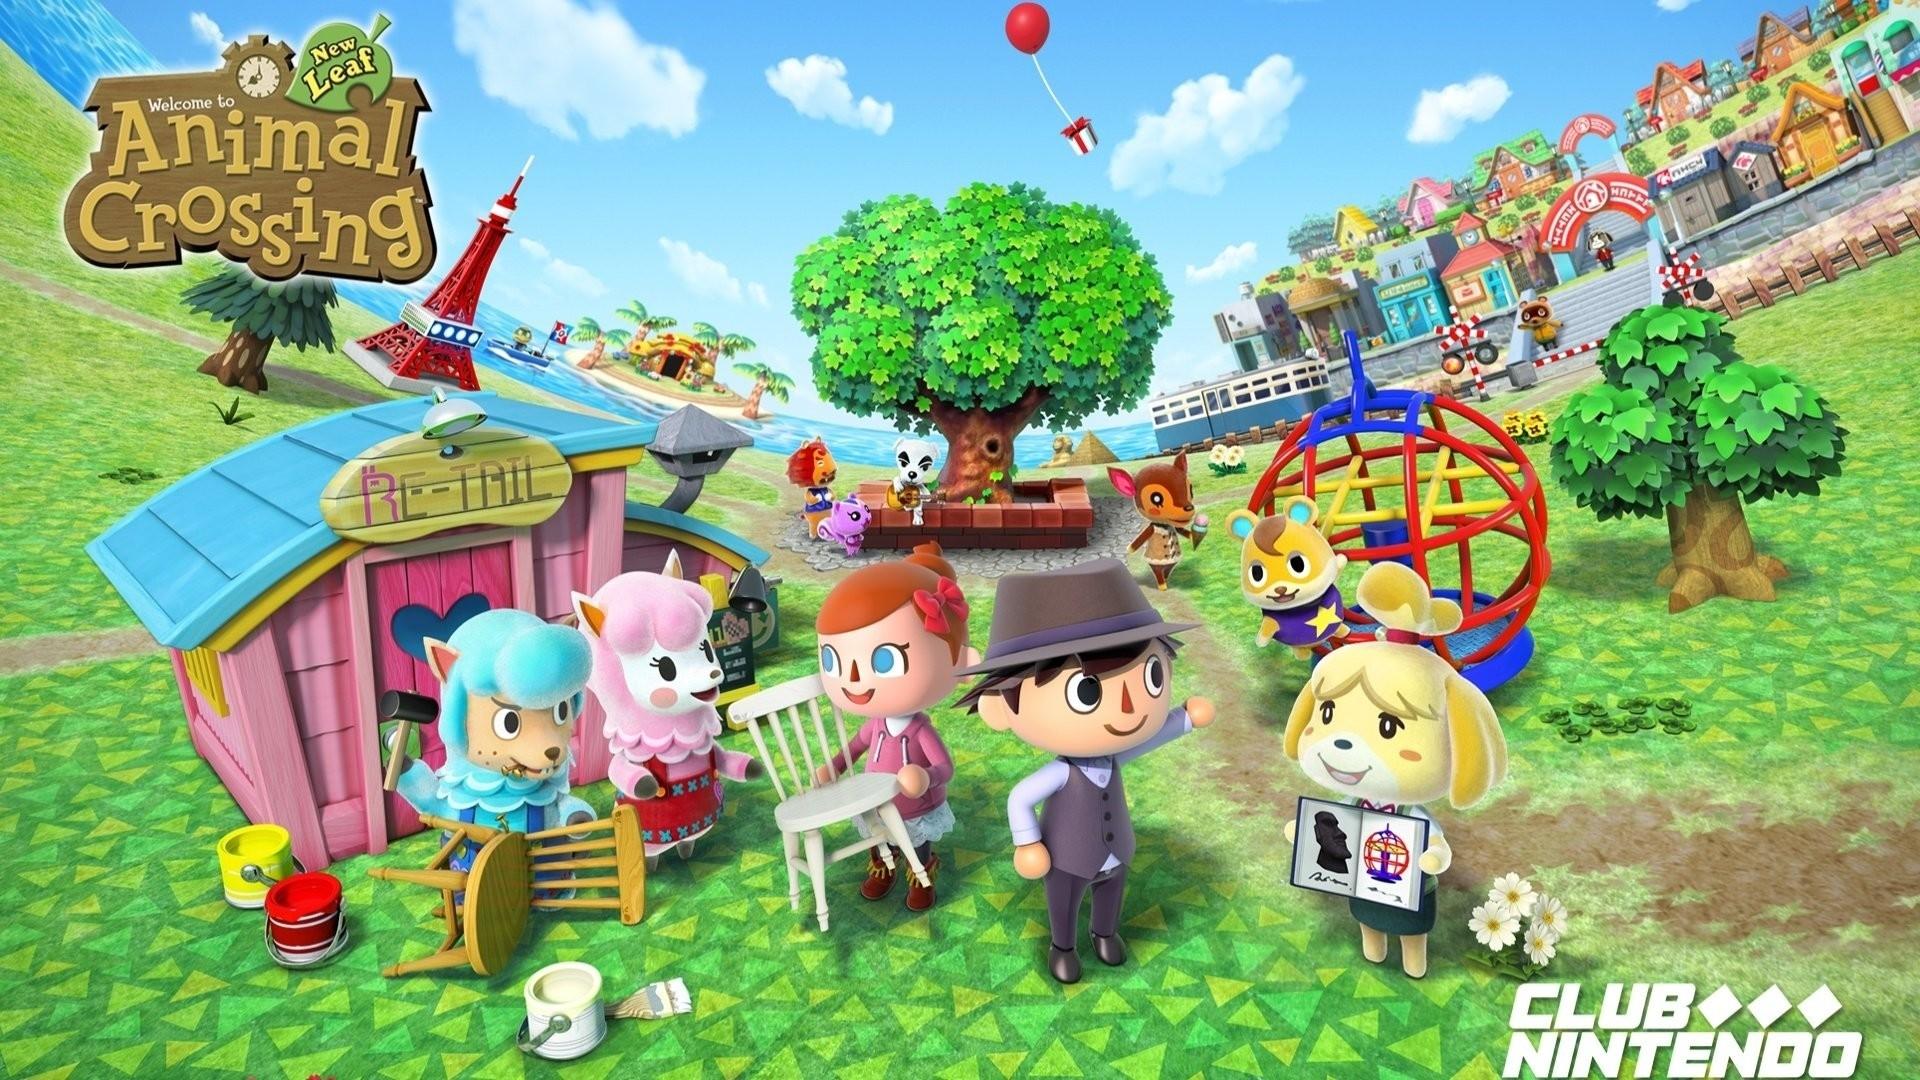 Animal Crossing hd wallpaper download